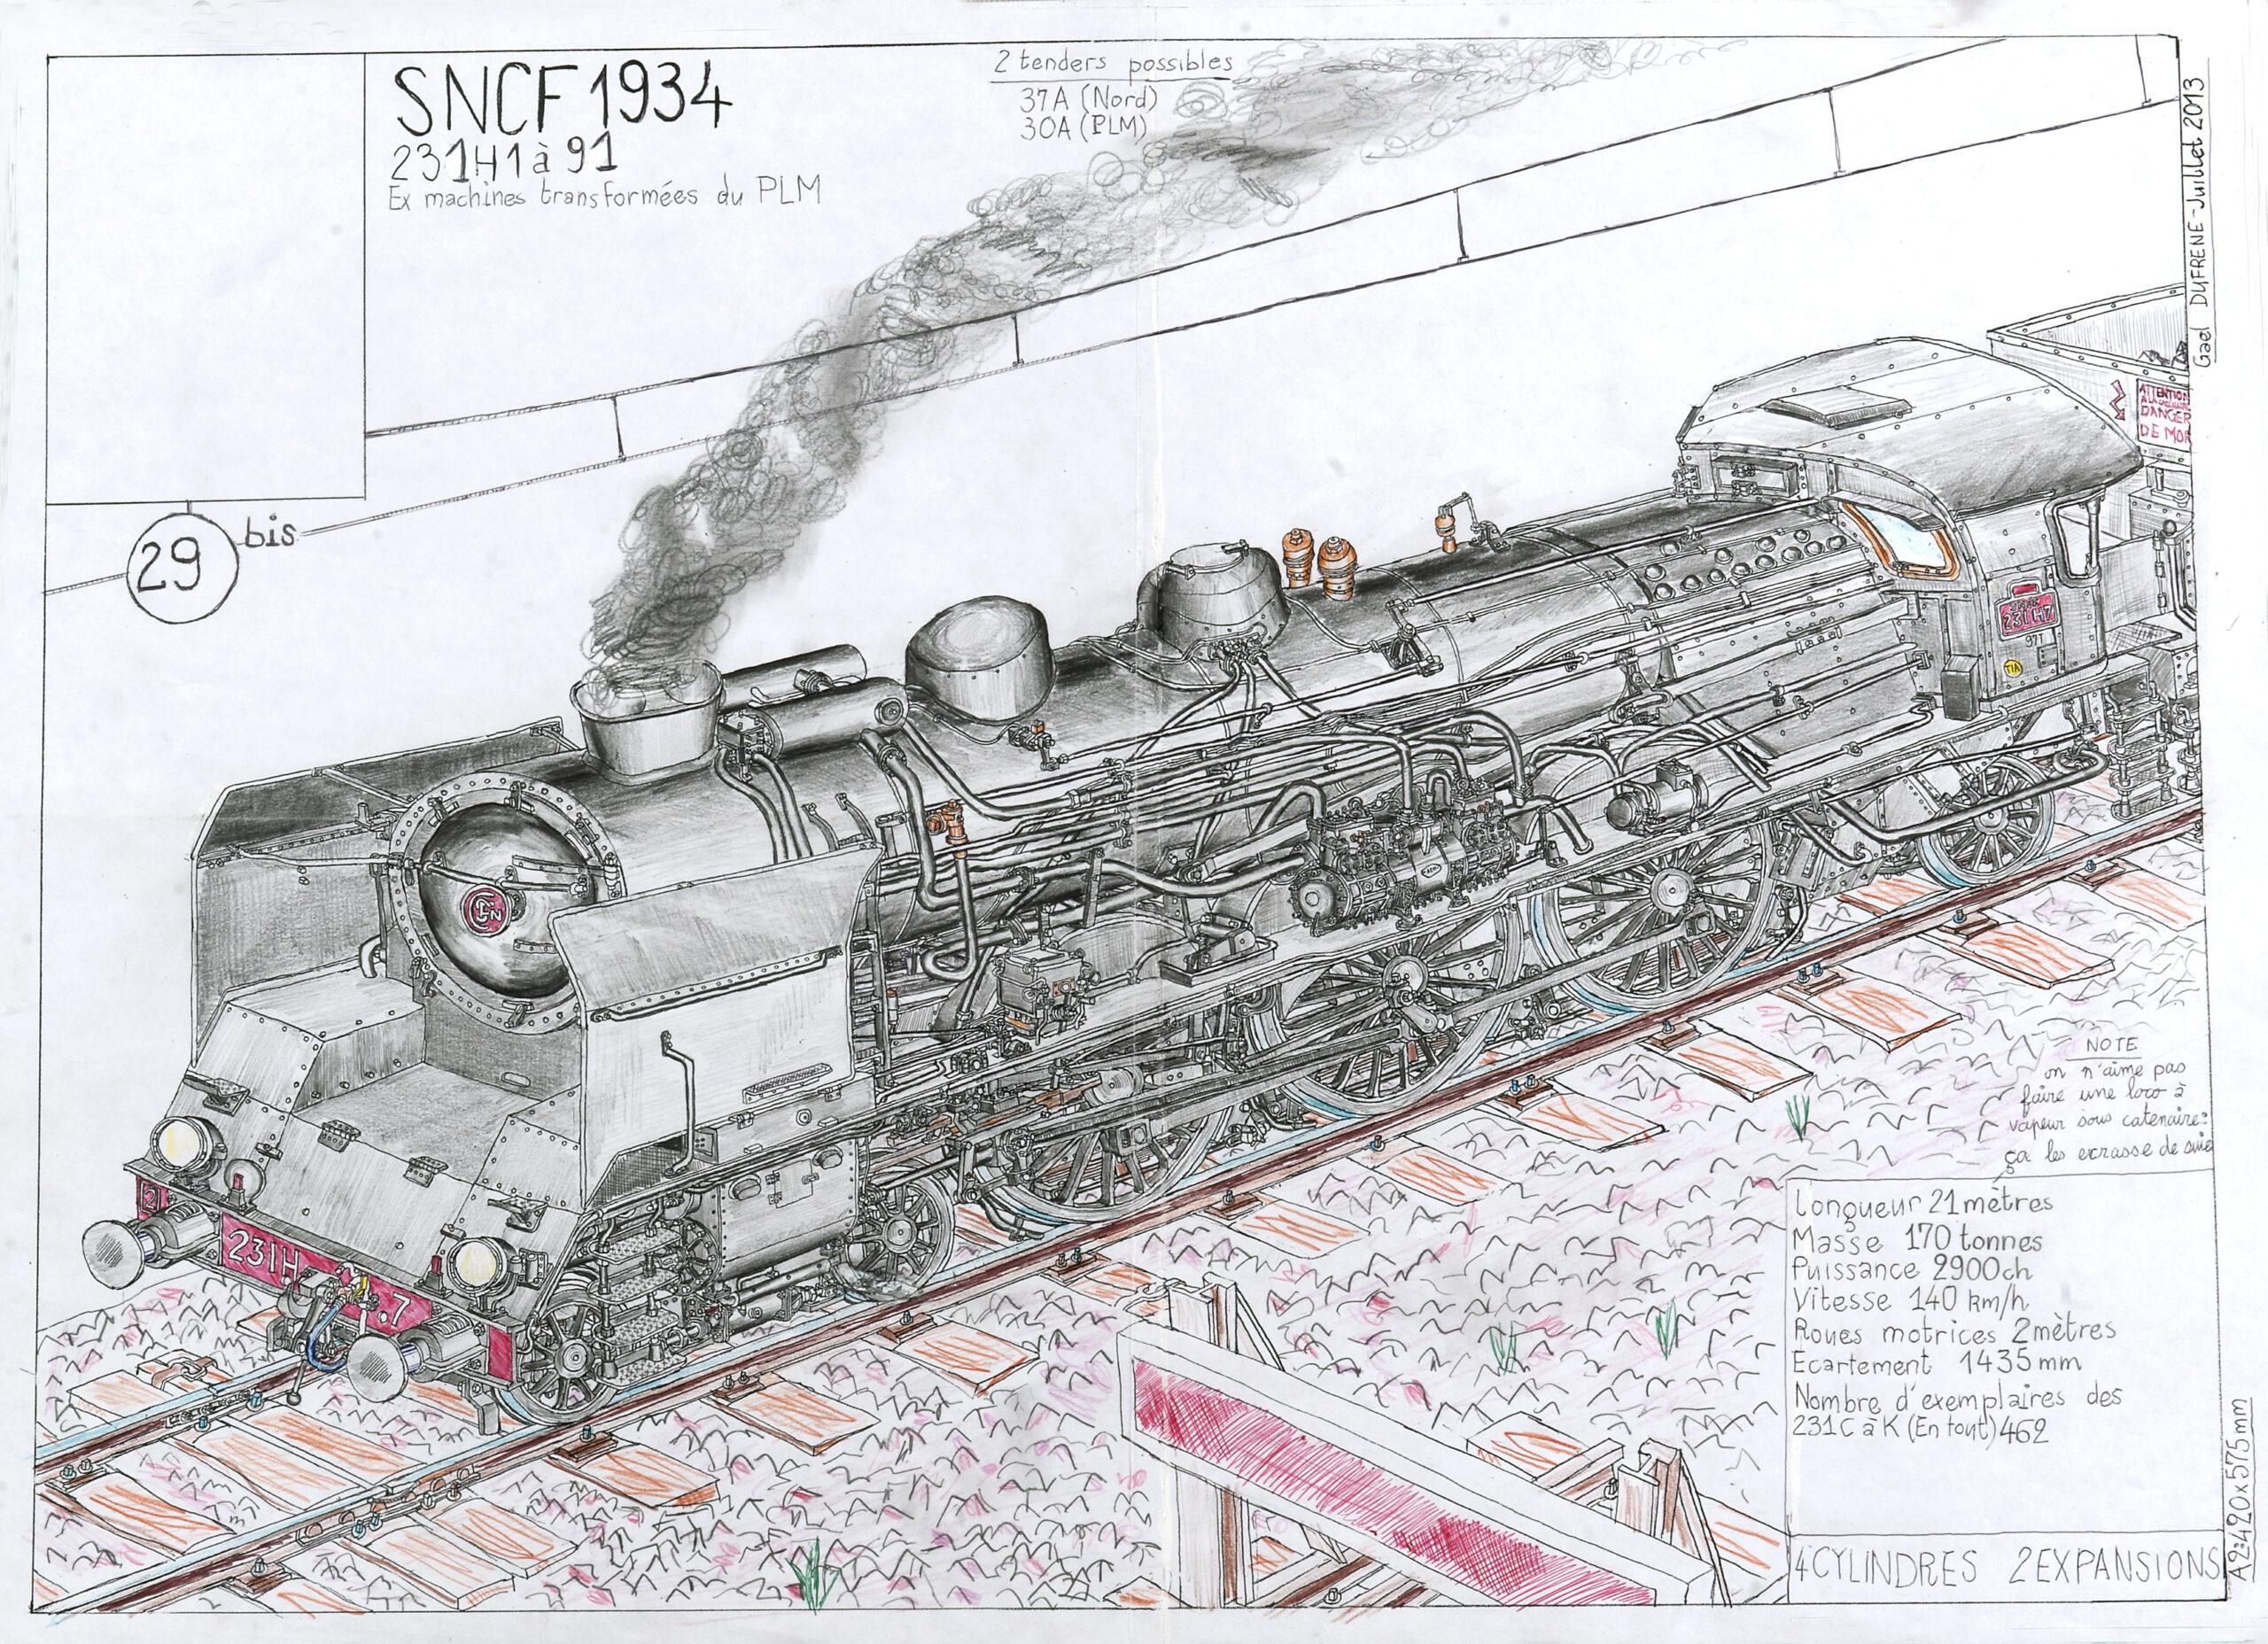 Gaël Dufrène, Locomotive 29bis 231H, 2013